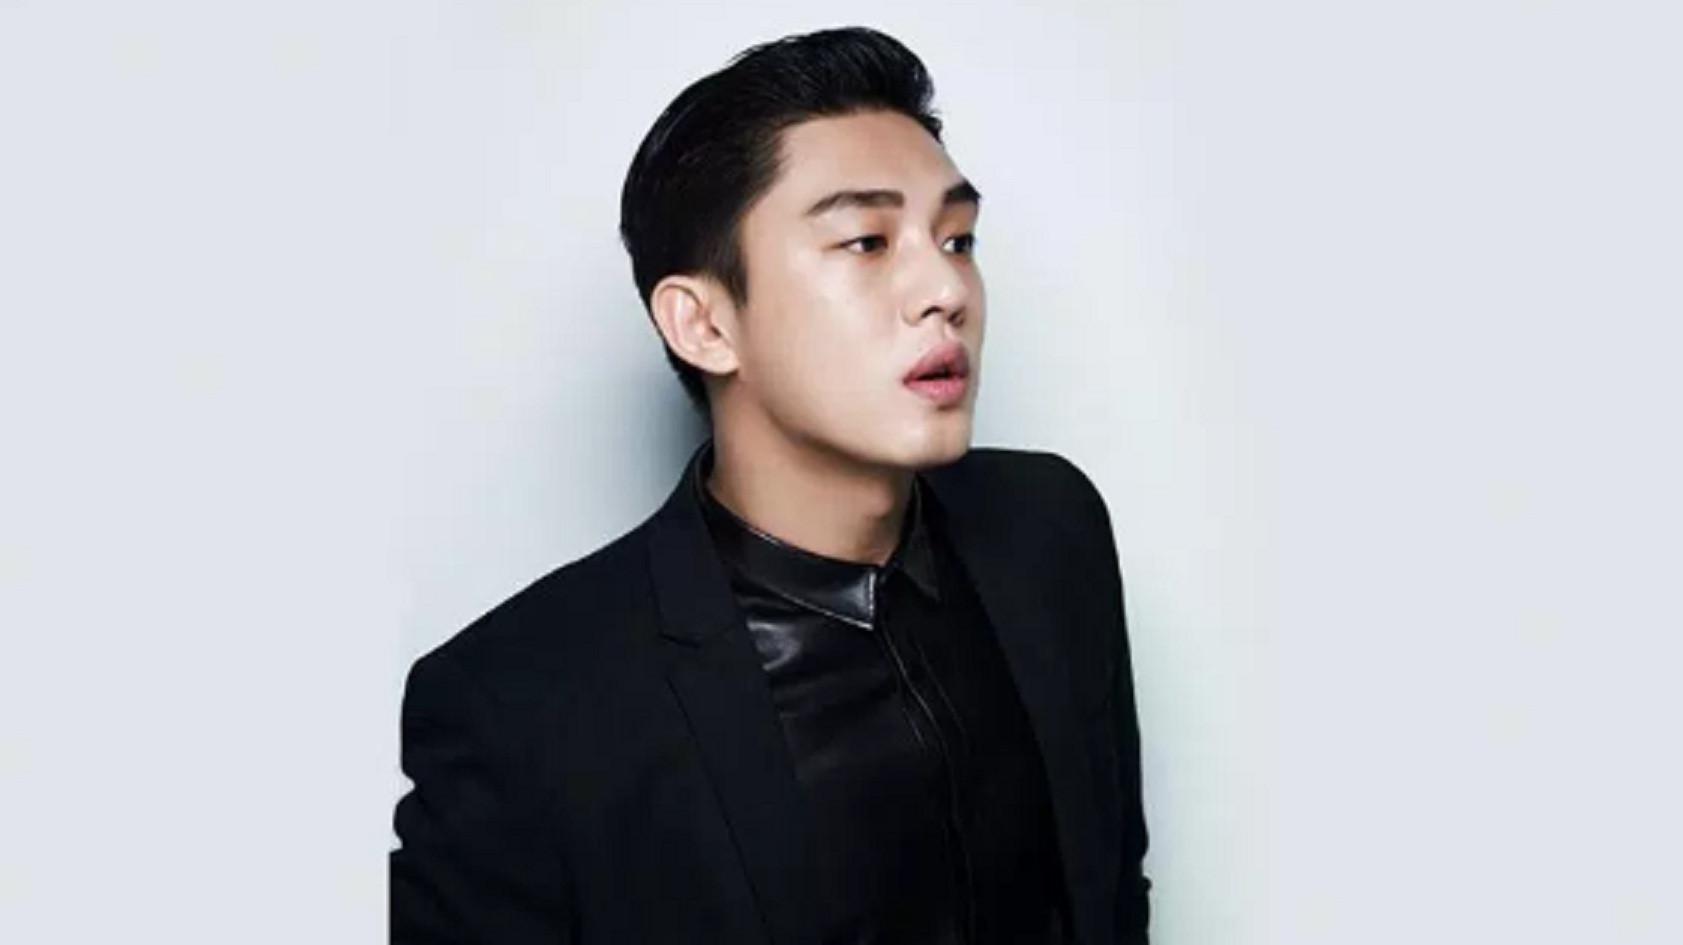 Yoo Ah In (Soompi)